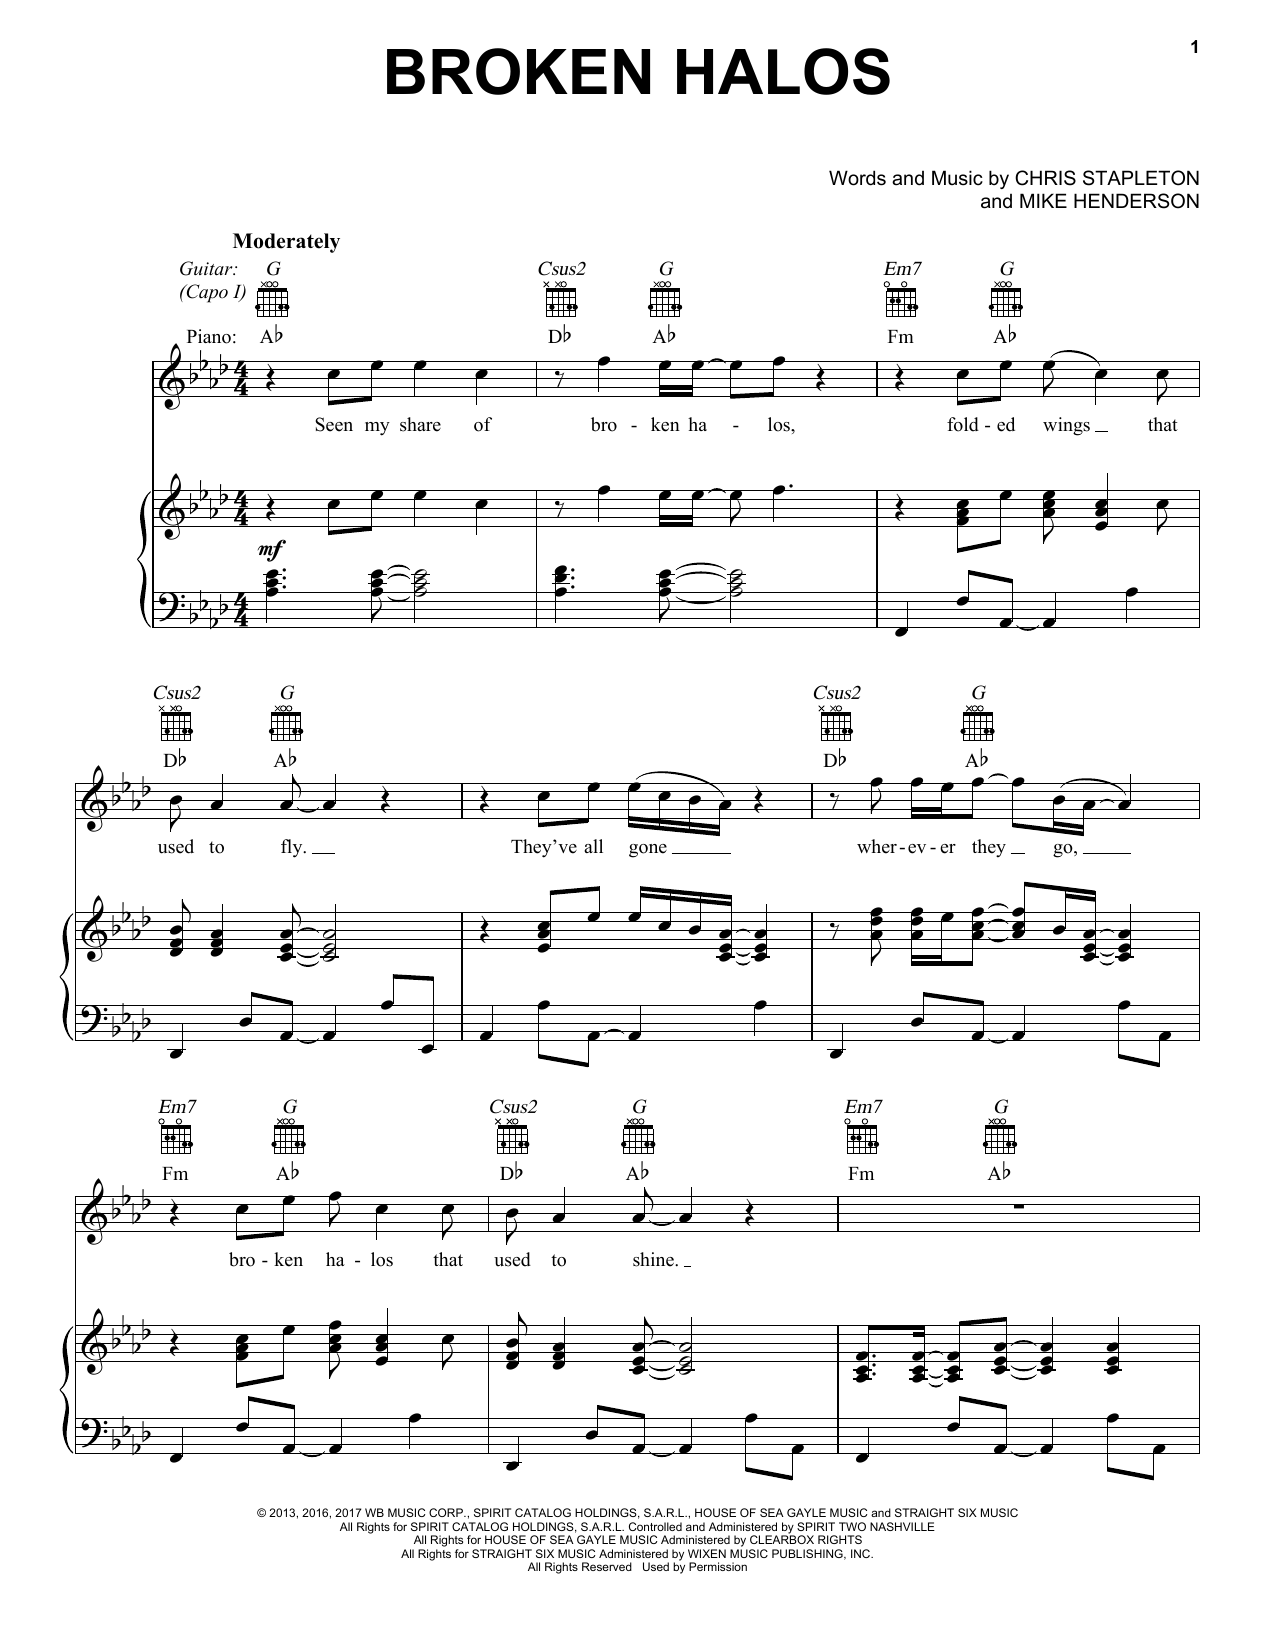 Chris Stapleton Broken Halos sheet music notes and chords. Download Printable PDF.